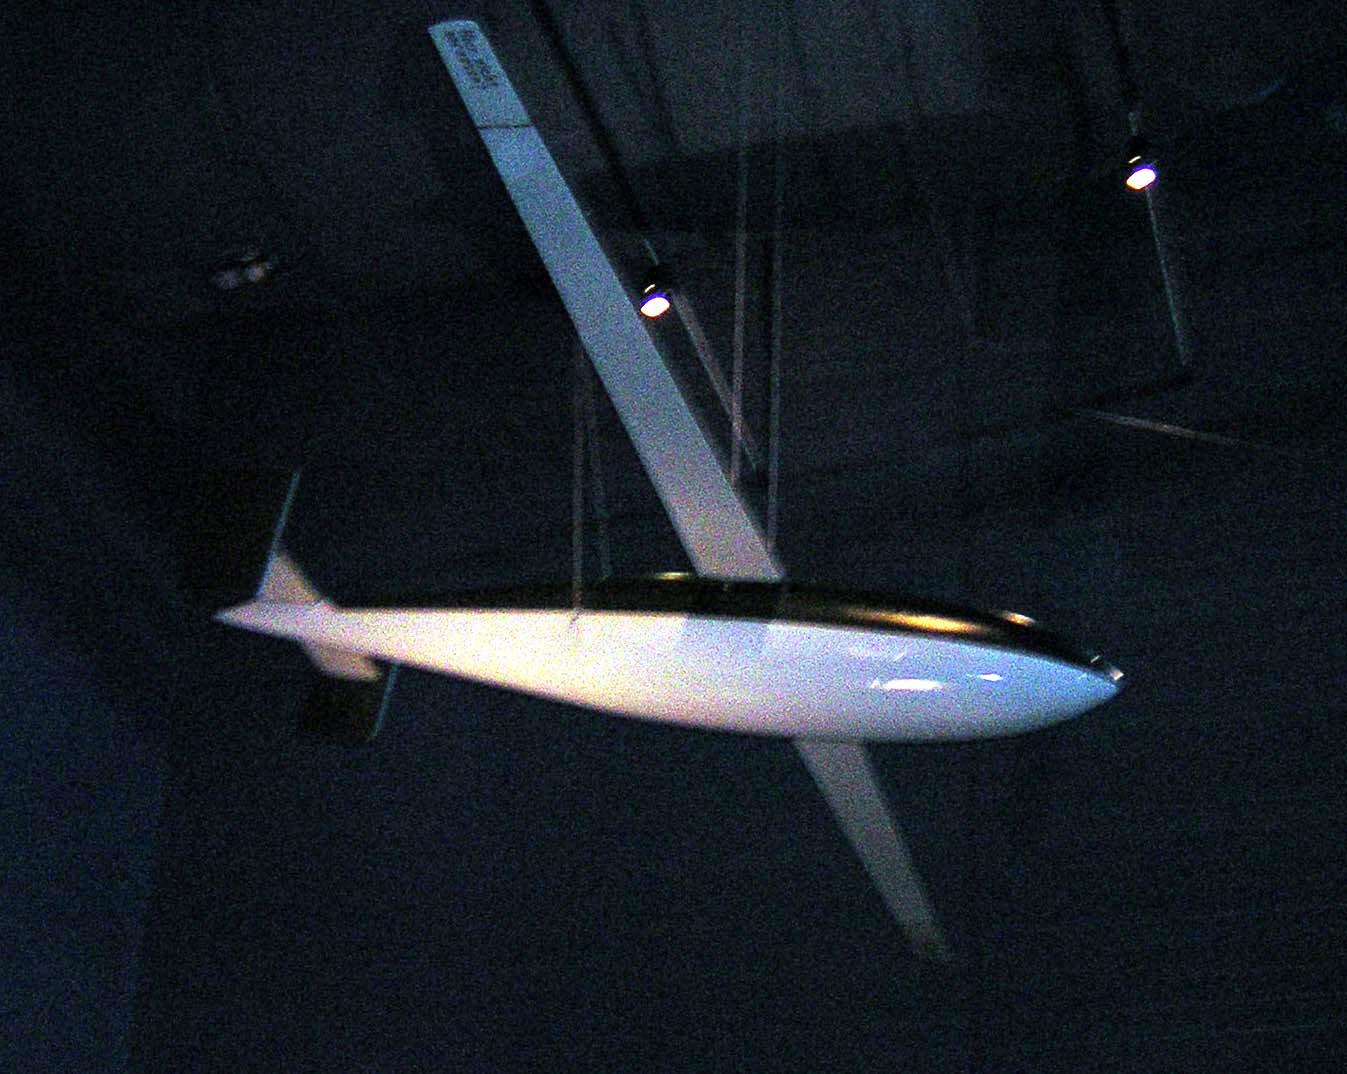 Image of : Bomb, Glide, BV 246 Hagelkorn (Hailstone)